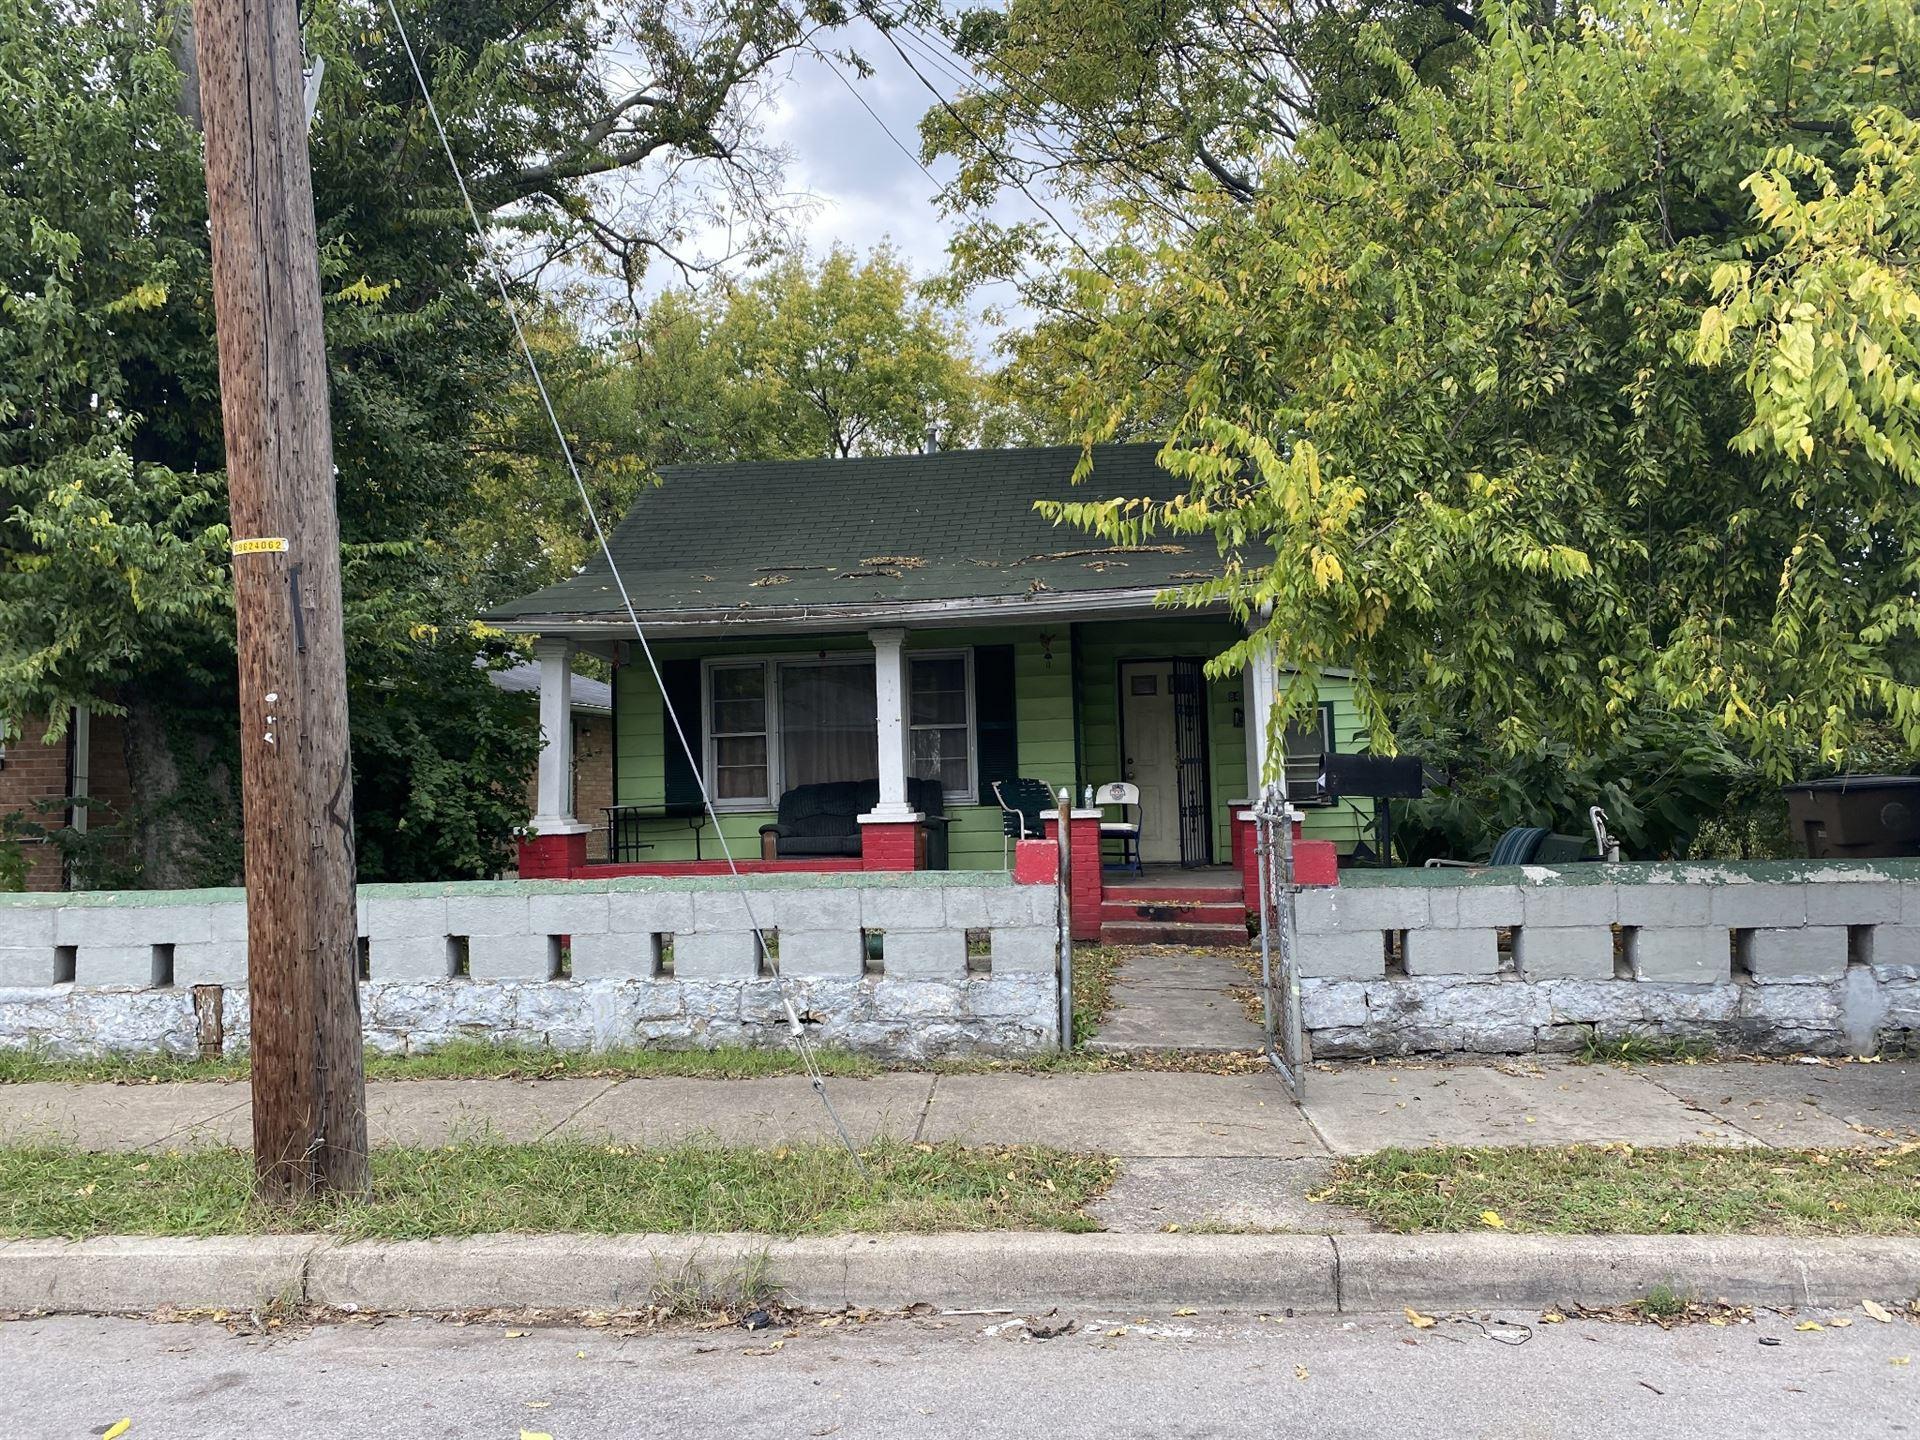 84 Green St, Nashville, TN 37210 - MLS#: 2197237